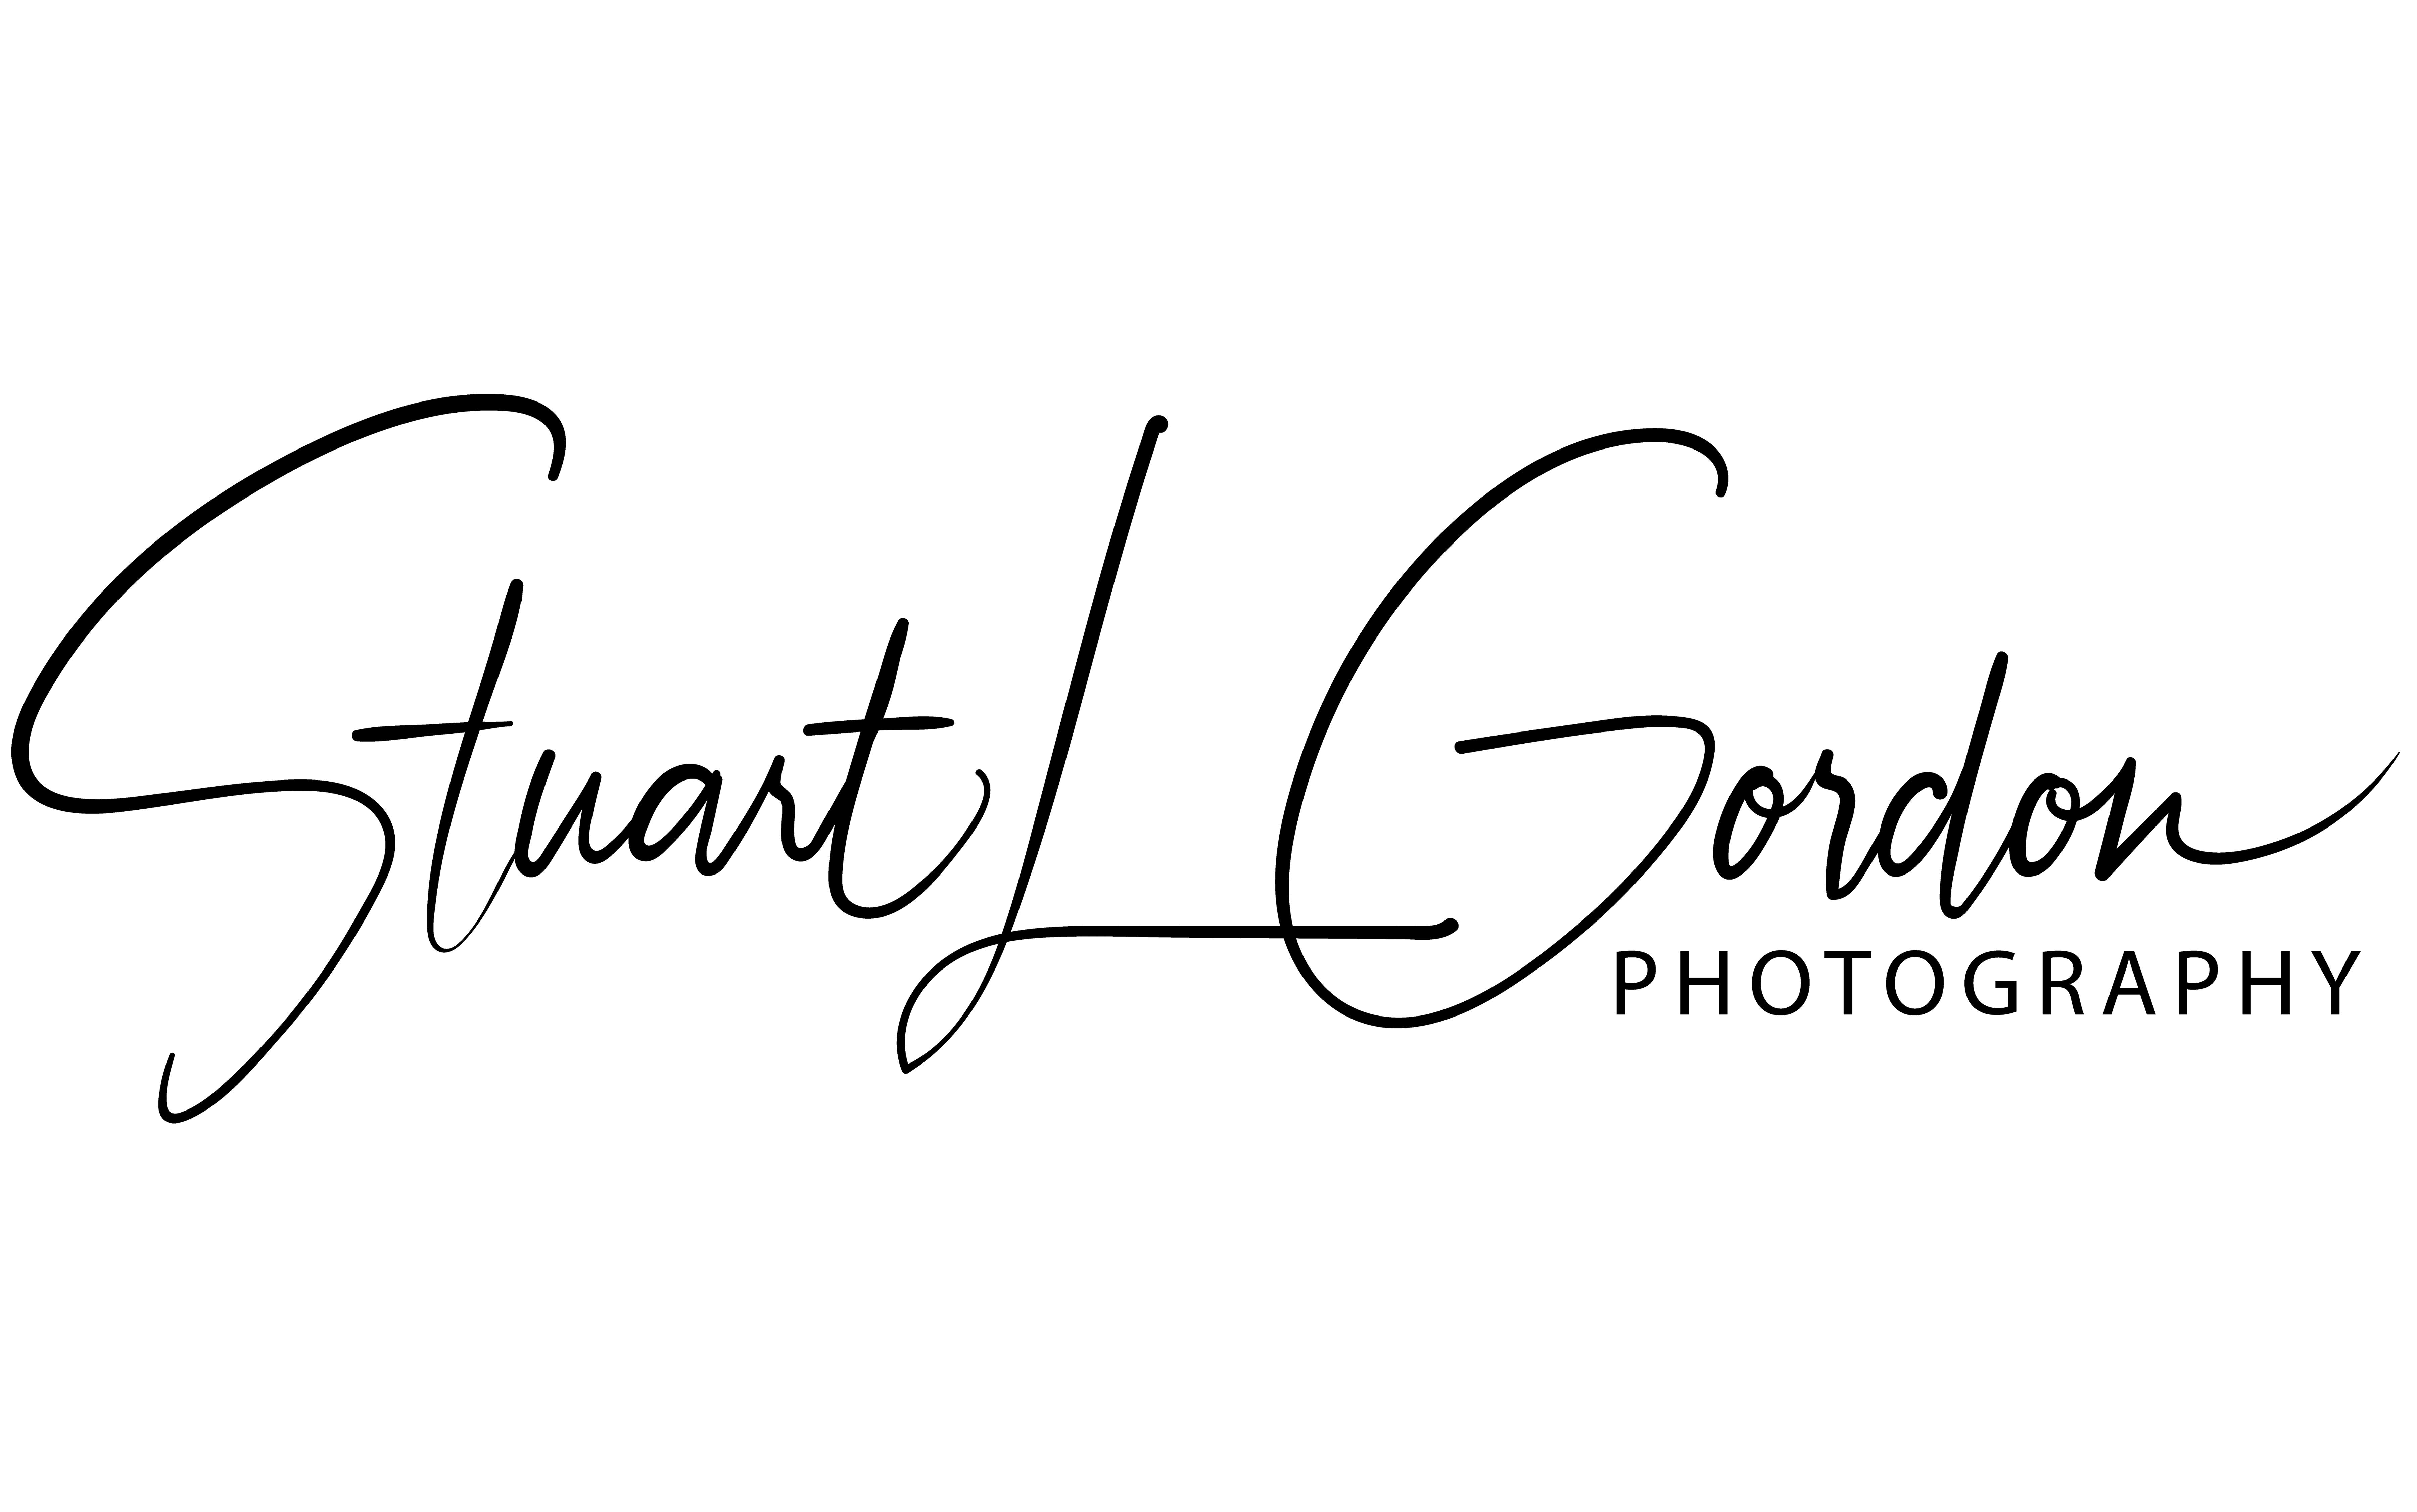 stuartlgordonphotography